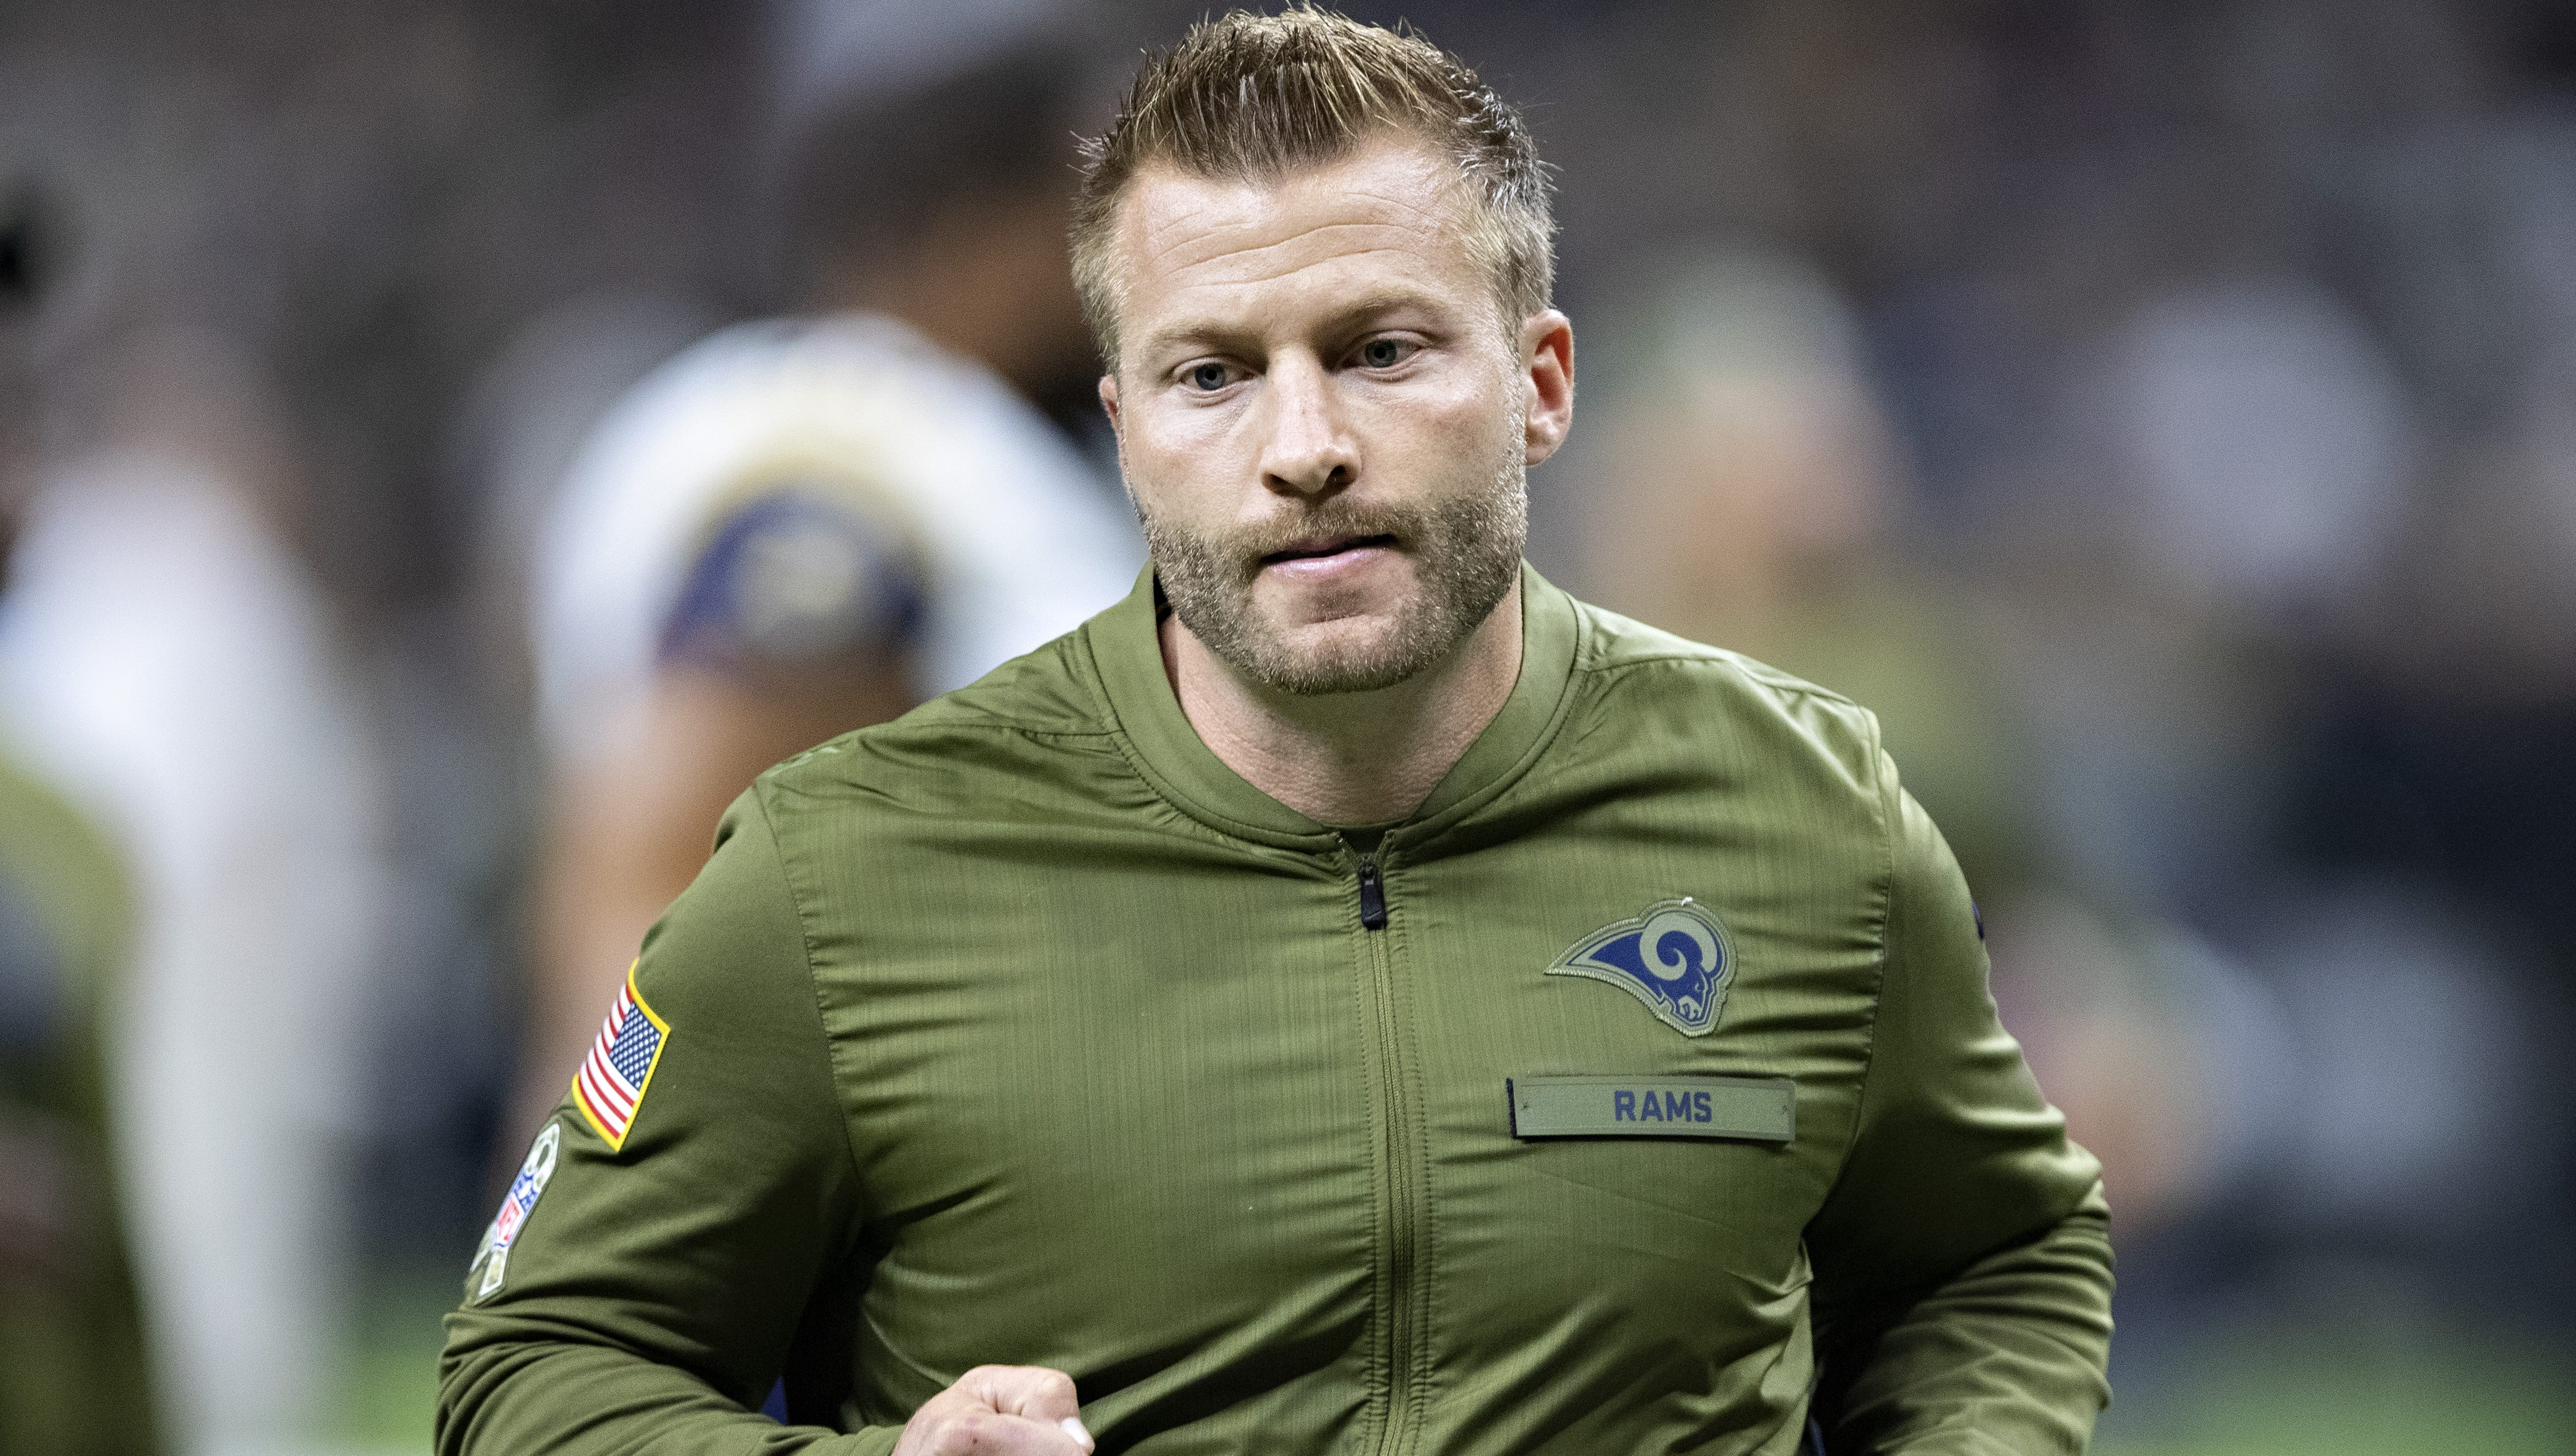 Sean Mcvay S Football Career Did Rams Coach Play In Nfl Heavy Com